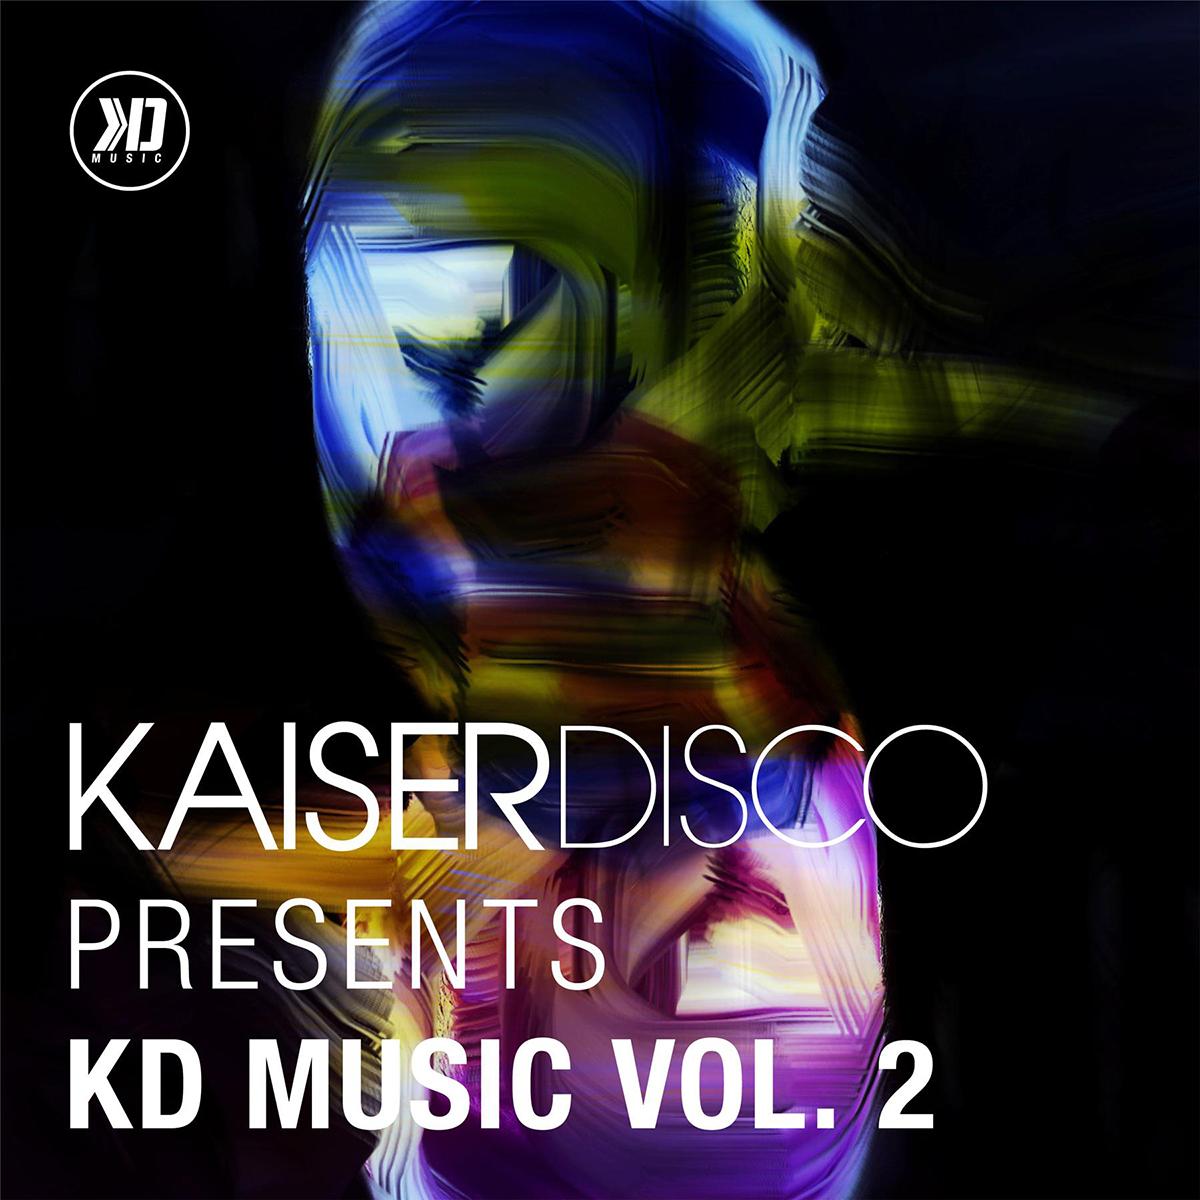 Kaiserdisco presents KD Music Vol. 2 (KD Music)